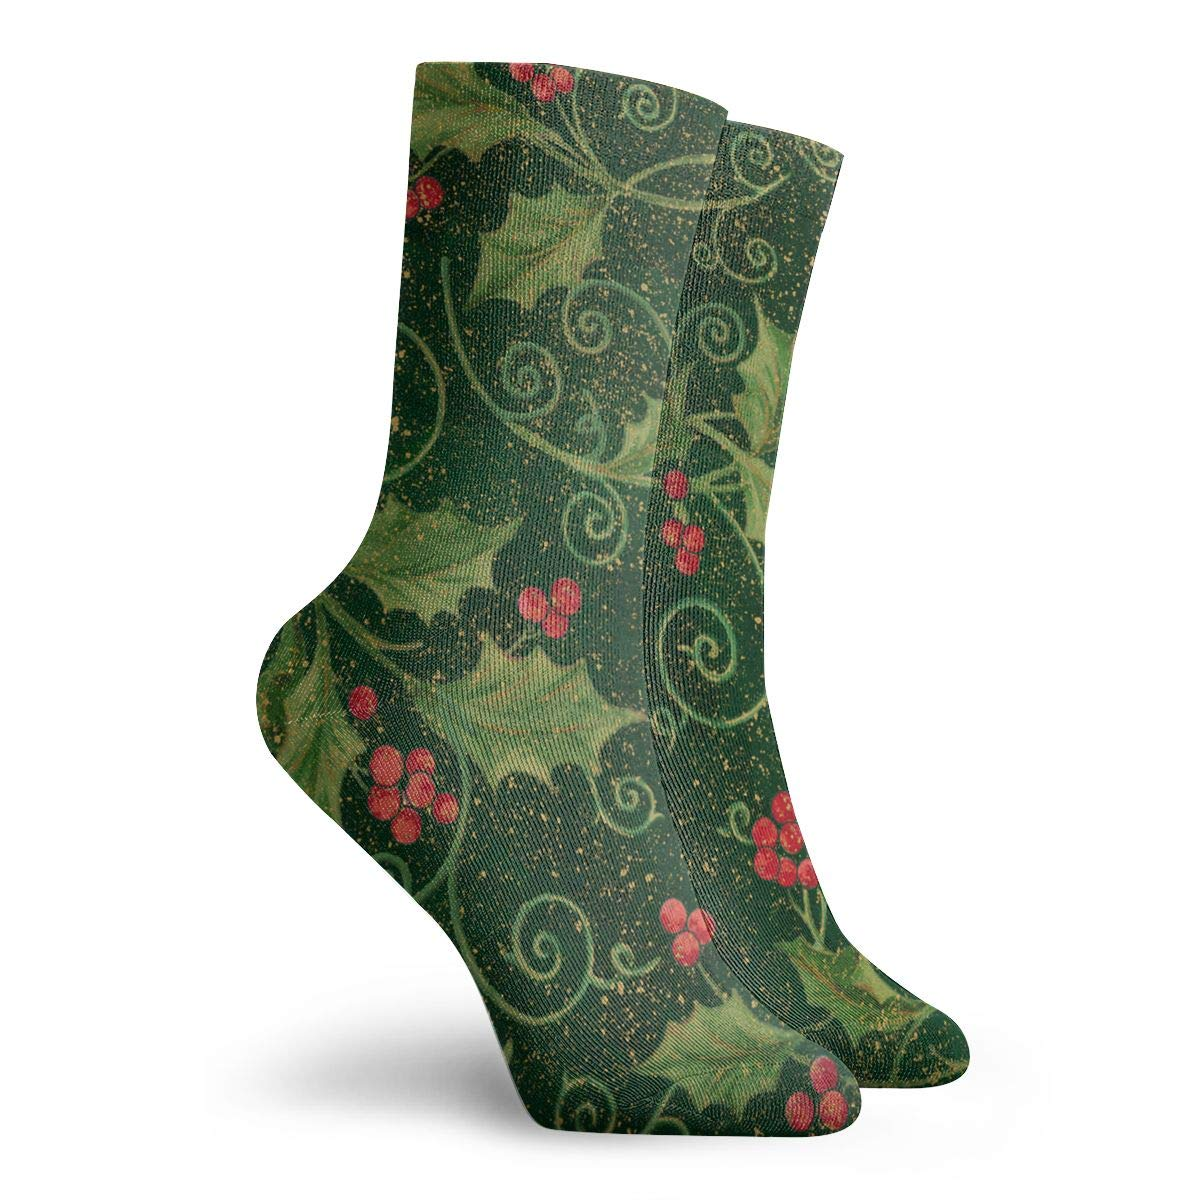 Christmas Holly Unisex Funny Casual Crew Socks Athletic Socks For Boys Girls Kids Teenagers